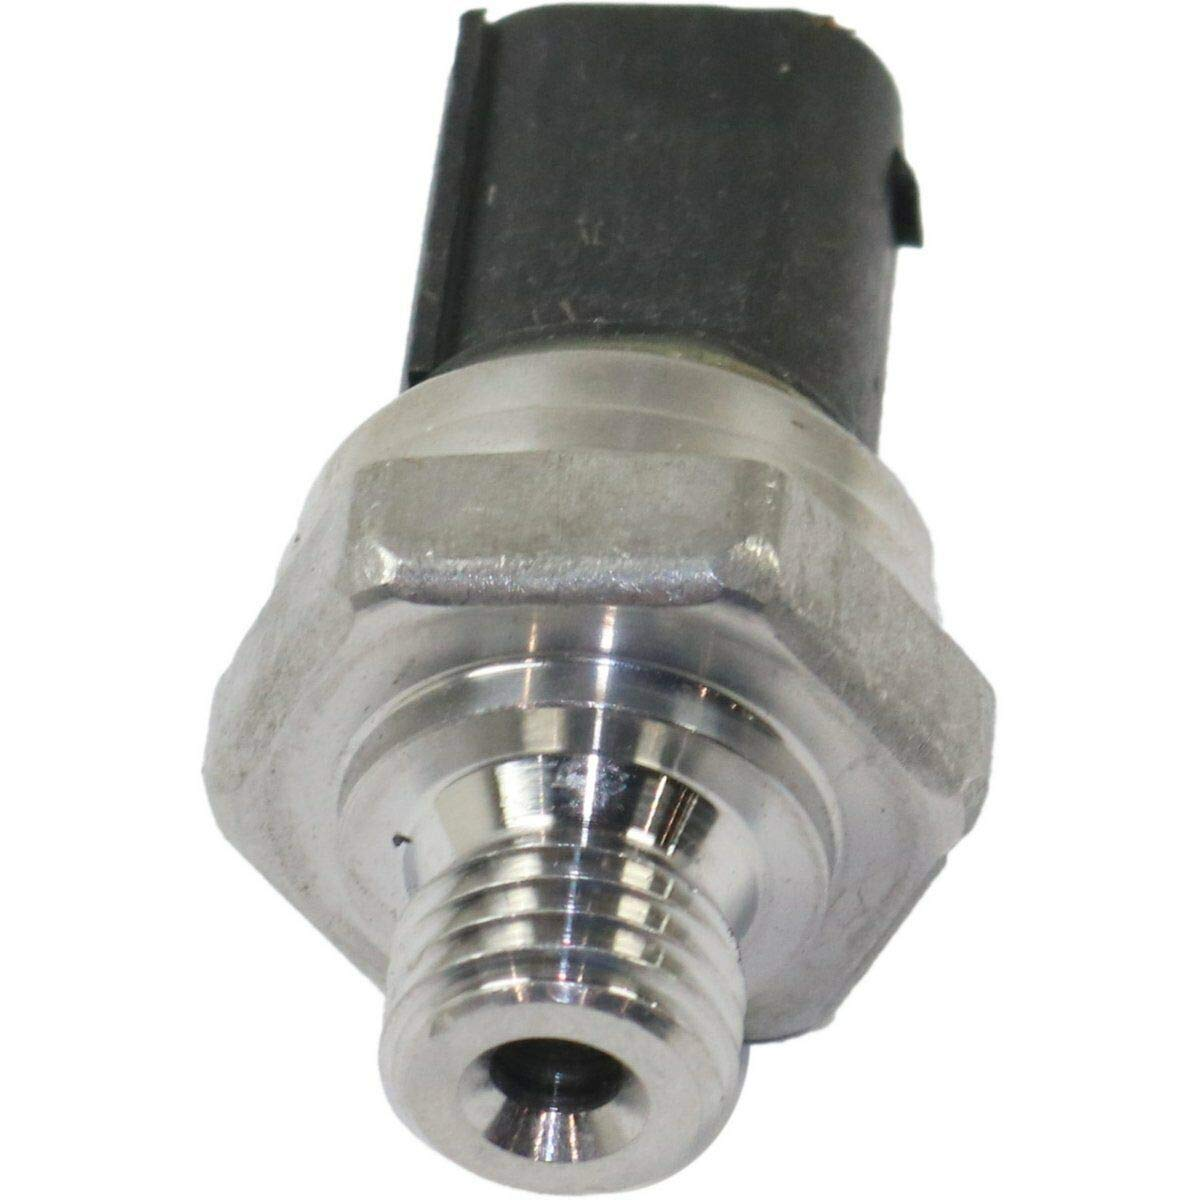 A0071534328 0071534328 EGR Seasonal Wrap Introduction Pressure Max 69% OFF Sensor Feedback Replacement